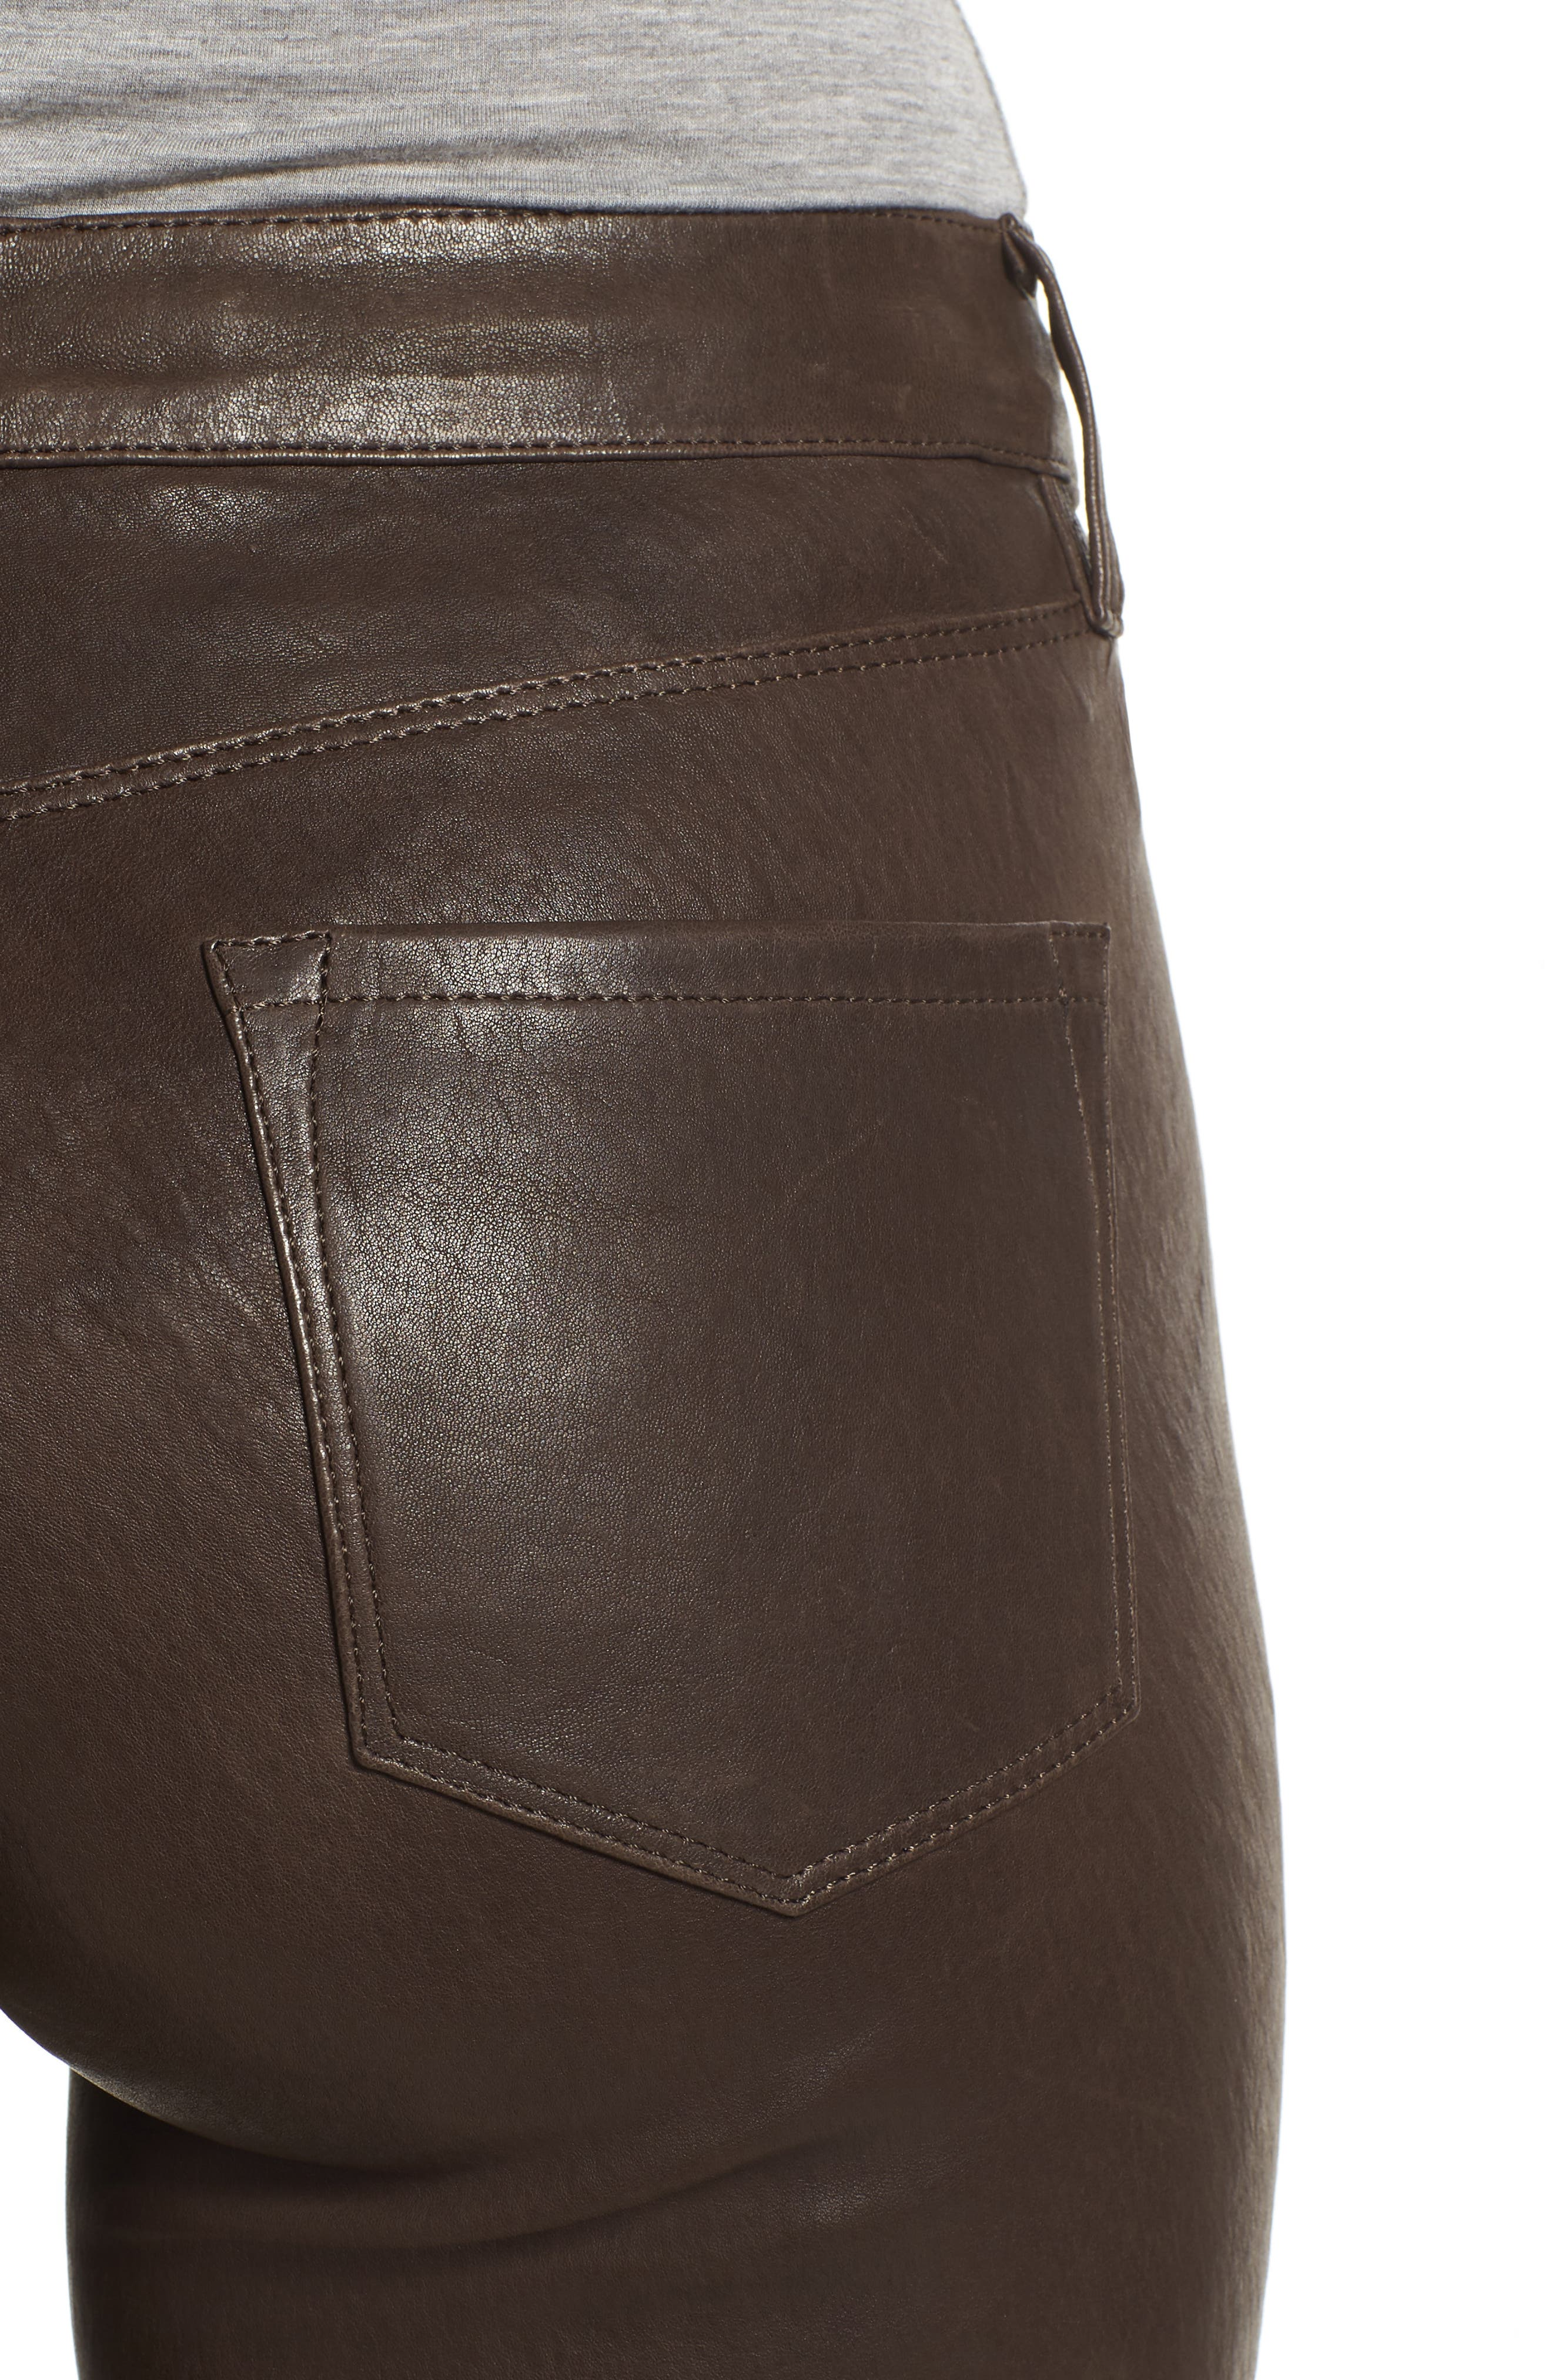 '8001' Lambskin Leather Pants,                             Alternate thumbnail 64, color,